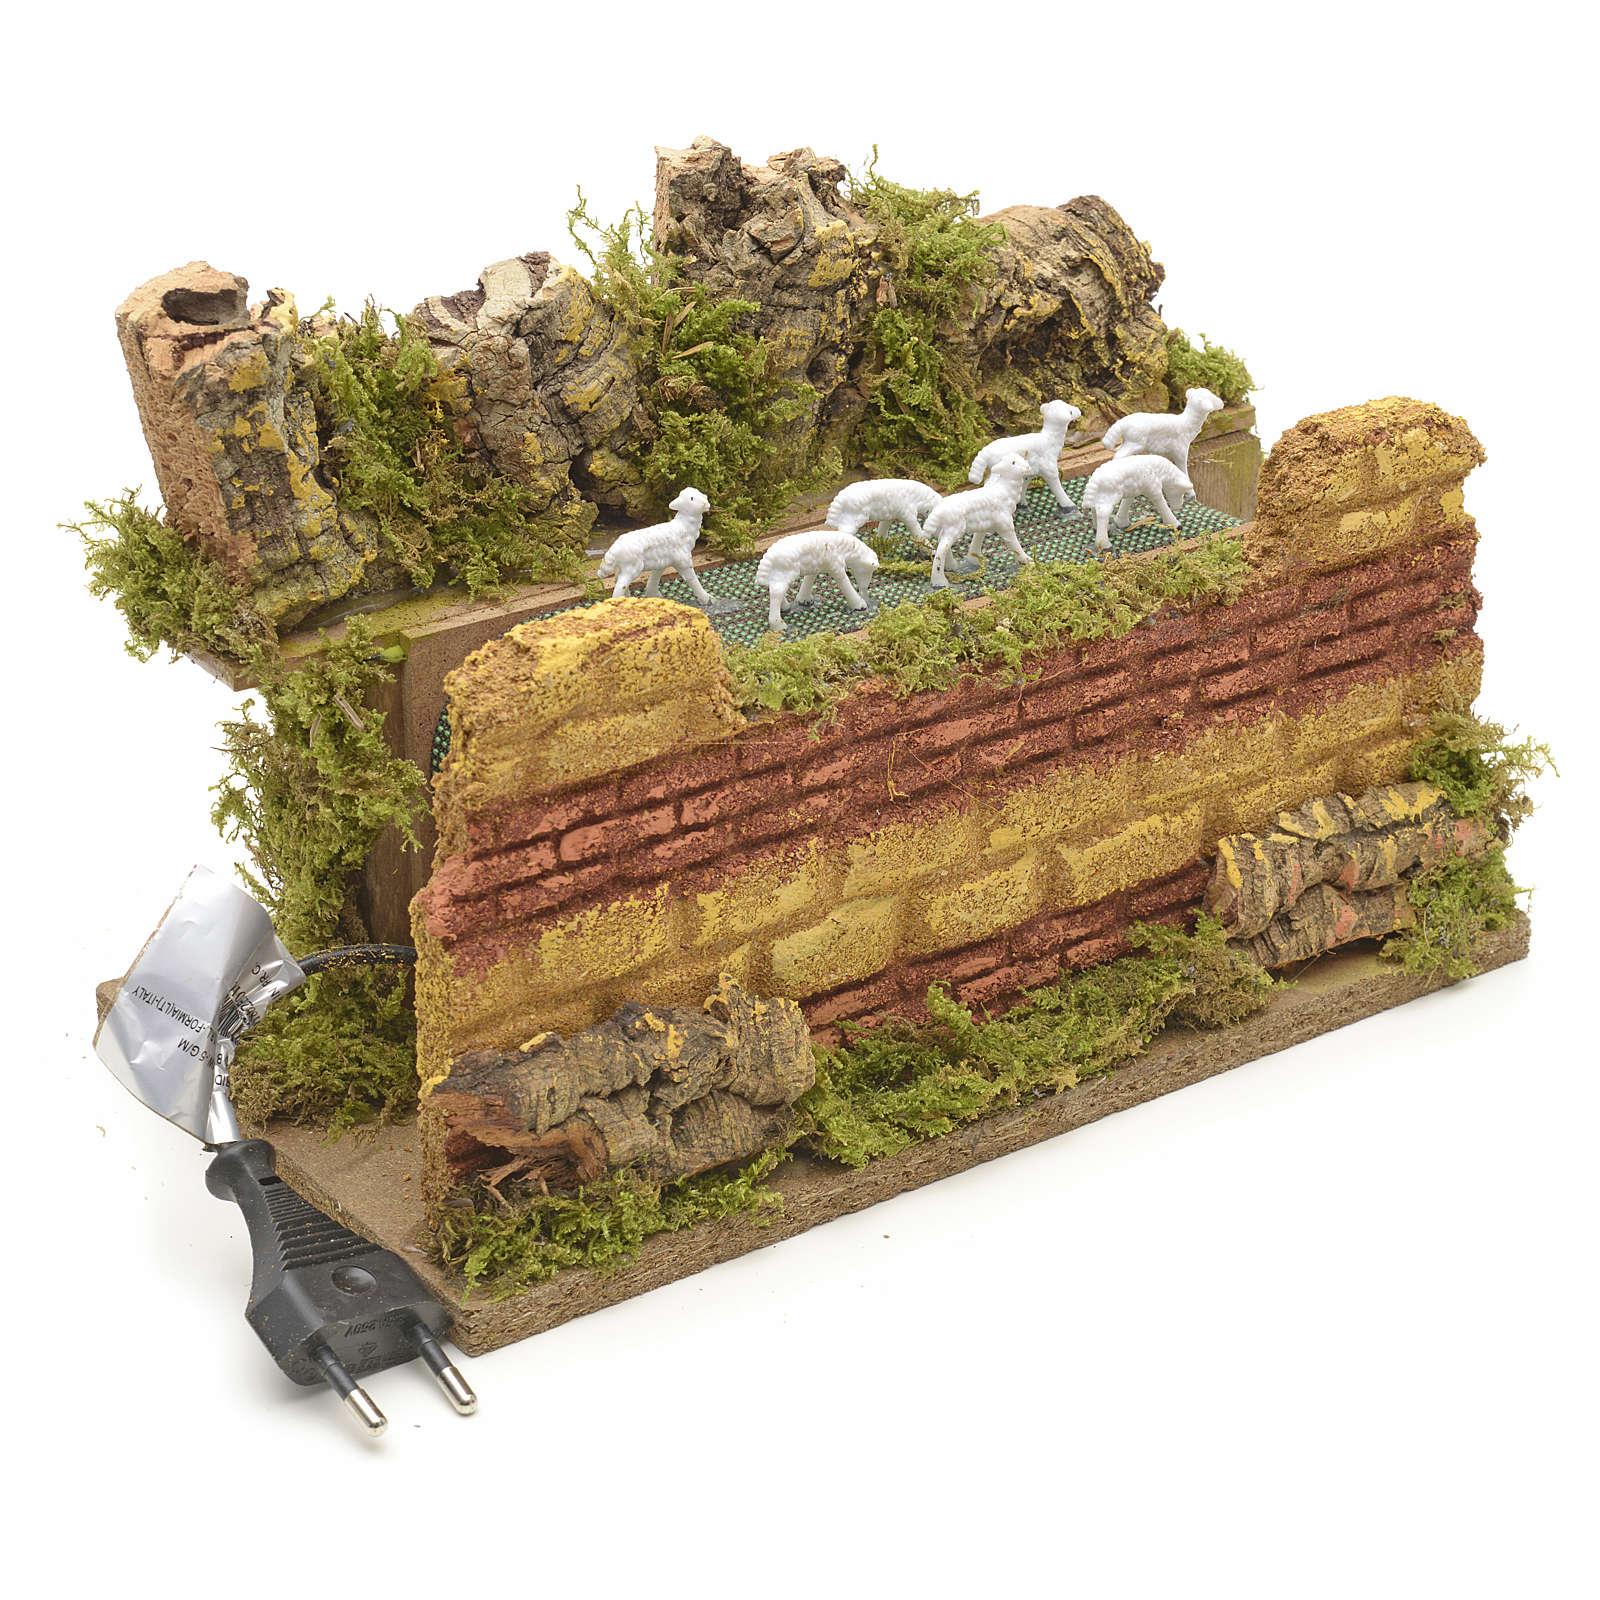 Animated nativity scene figurine, moving herd 25 x 14cm 3